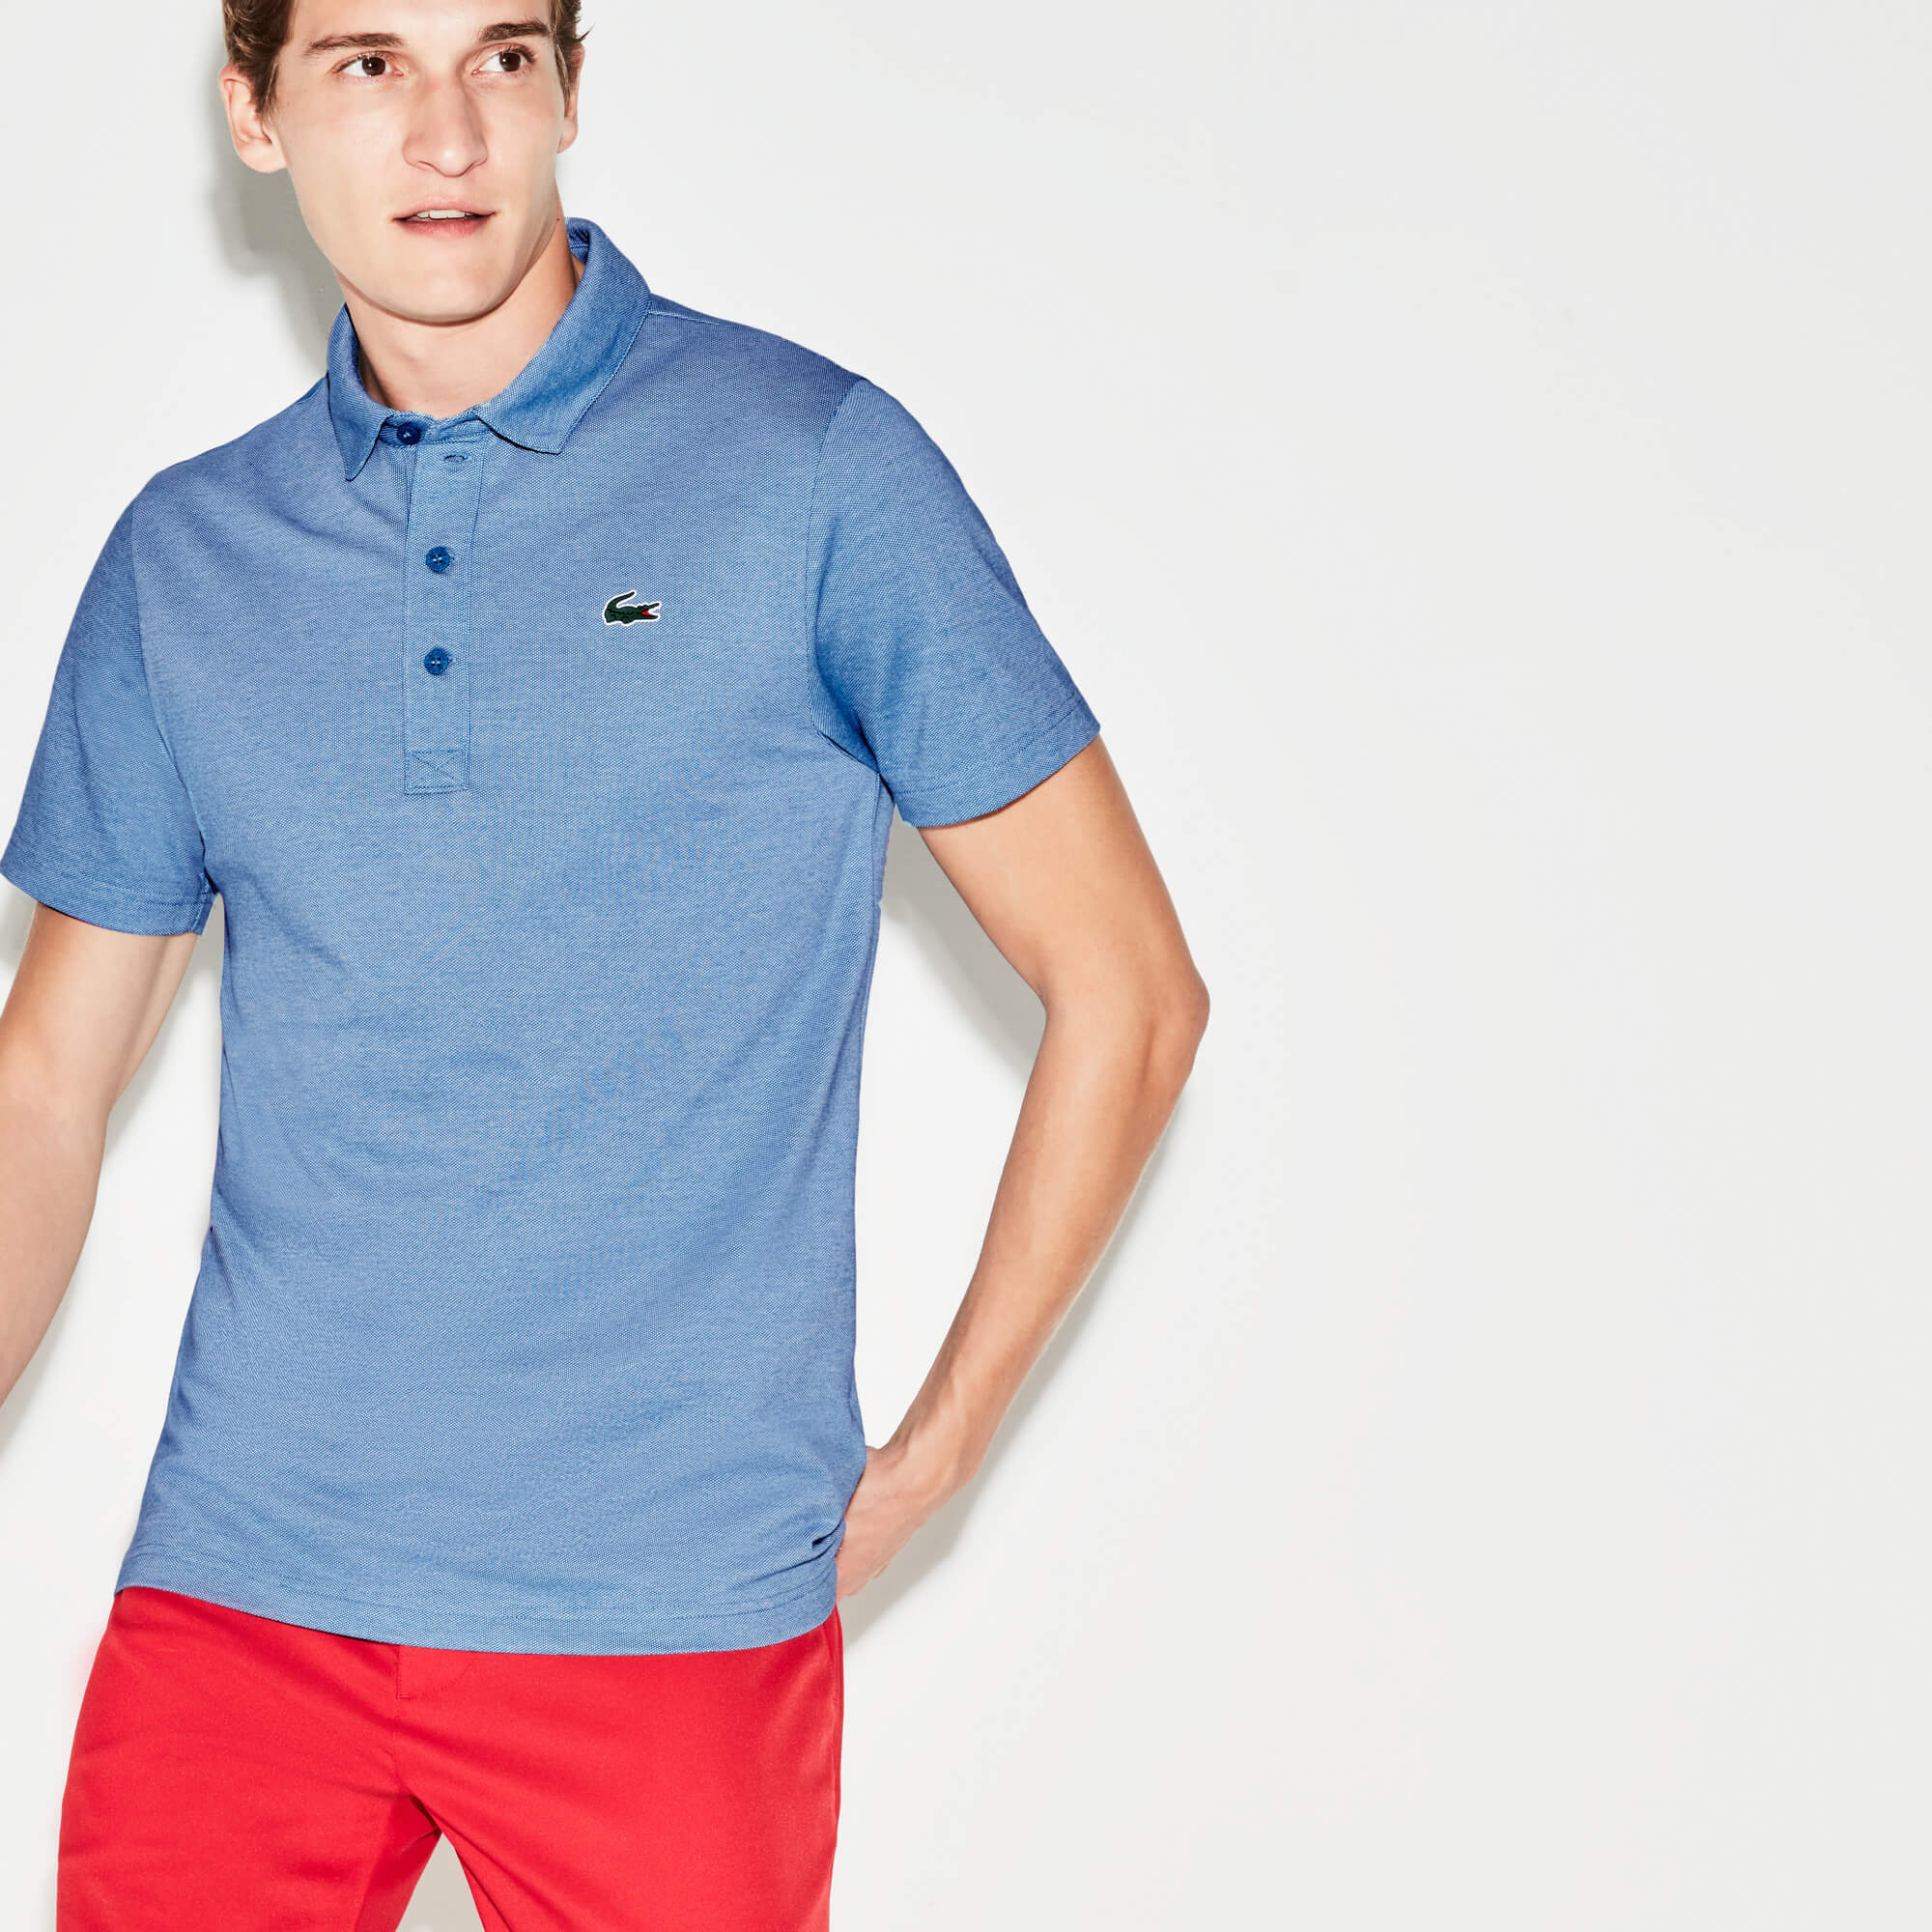 Men's Lacoste SPORT Bicolour Technical Jersey Golf Polo Shirt